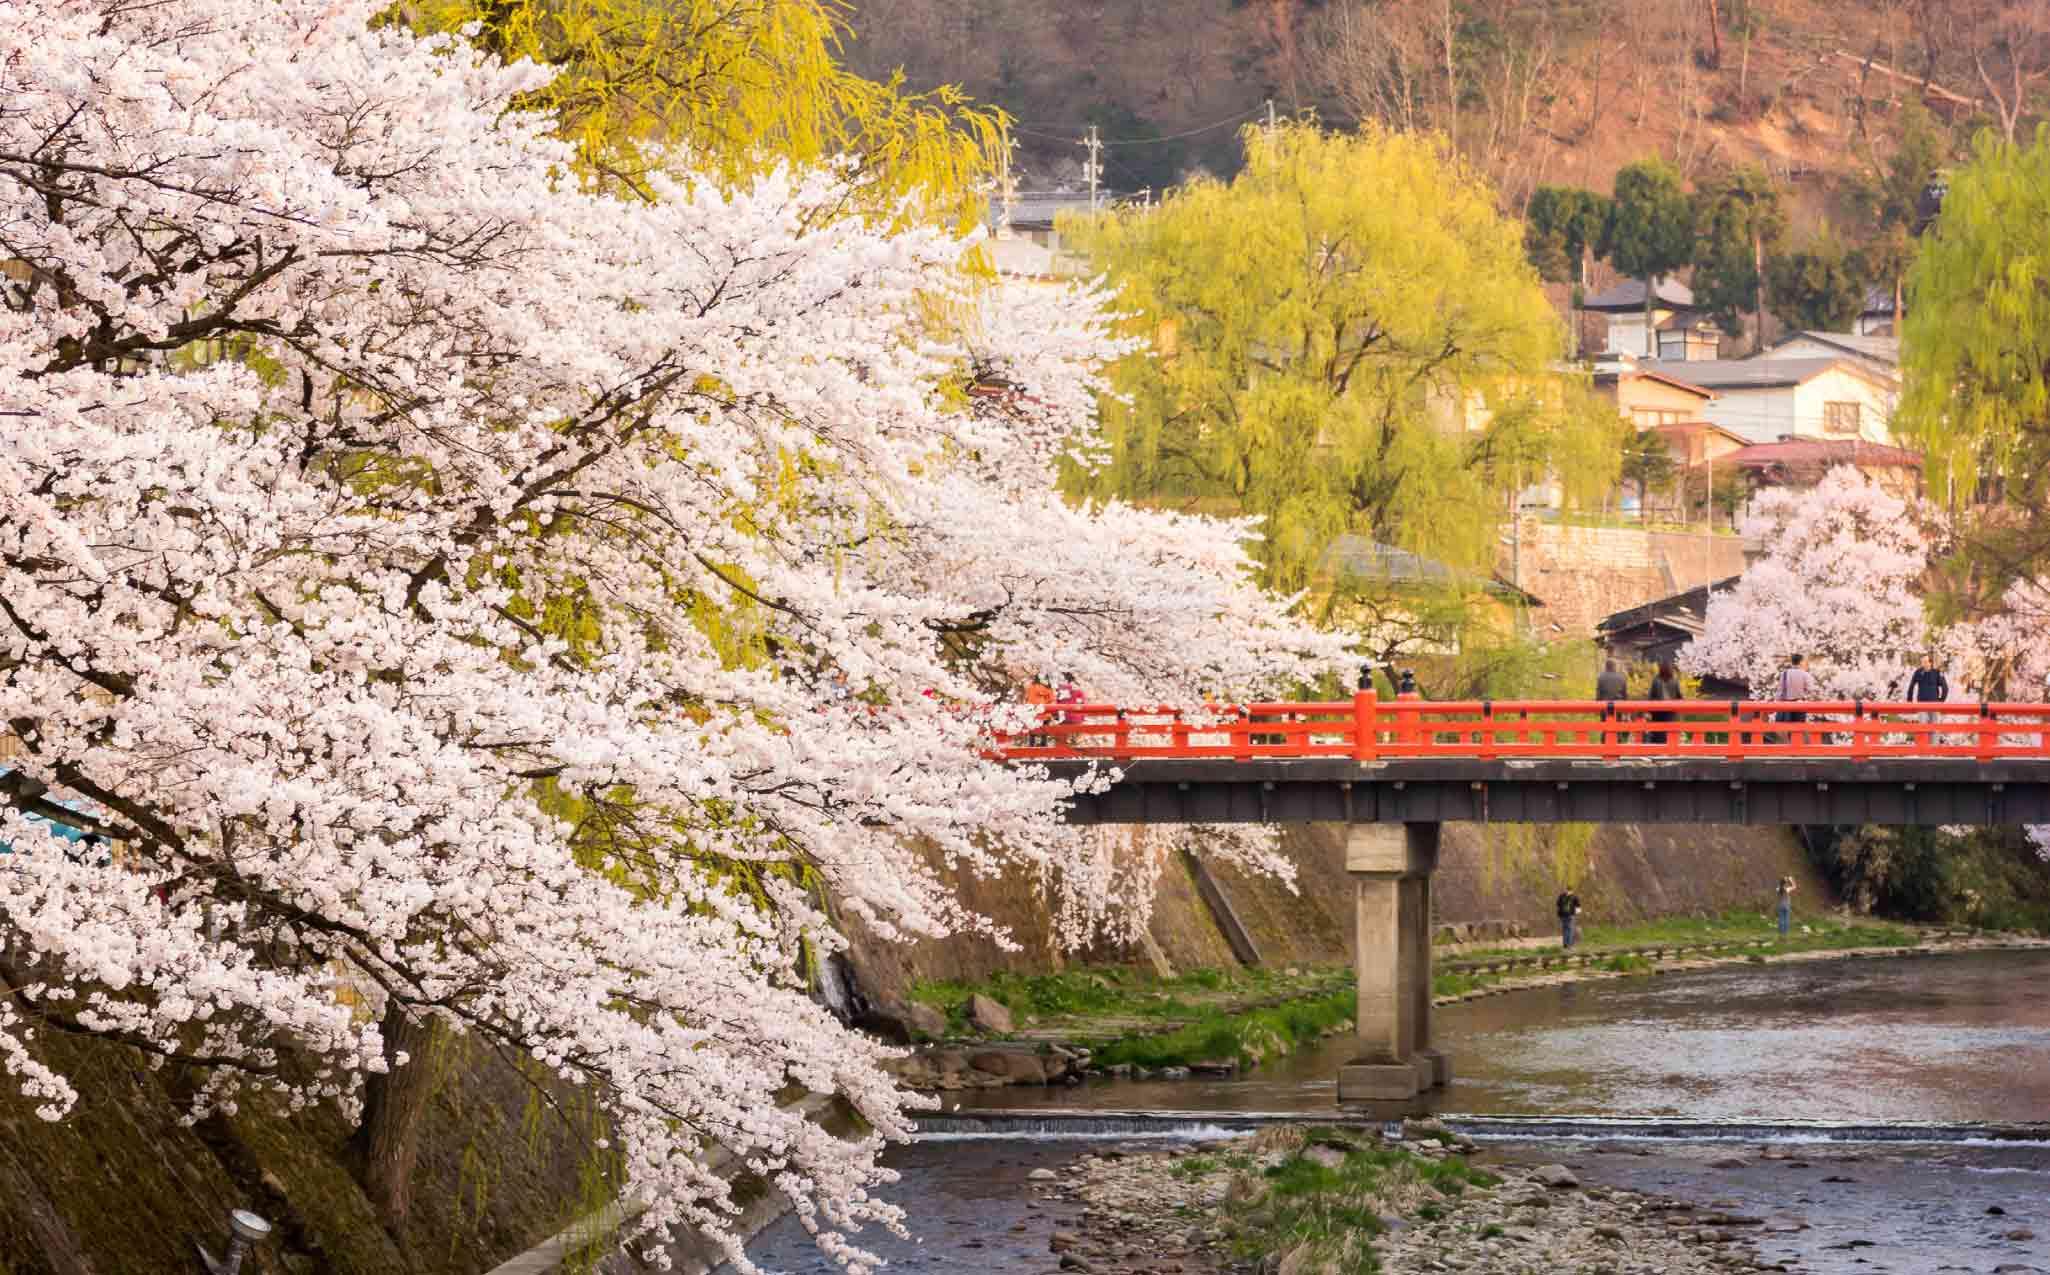 Japan Alps Takayama Cherry Blossom